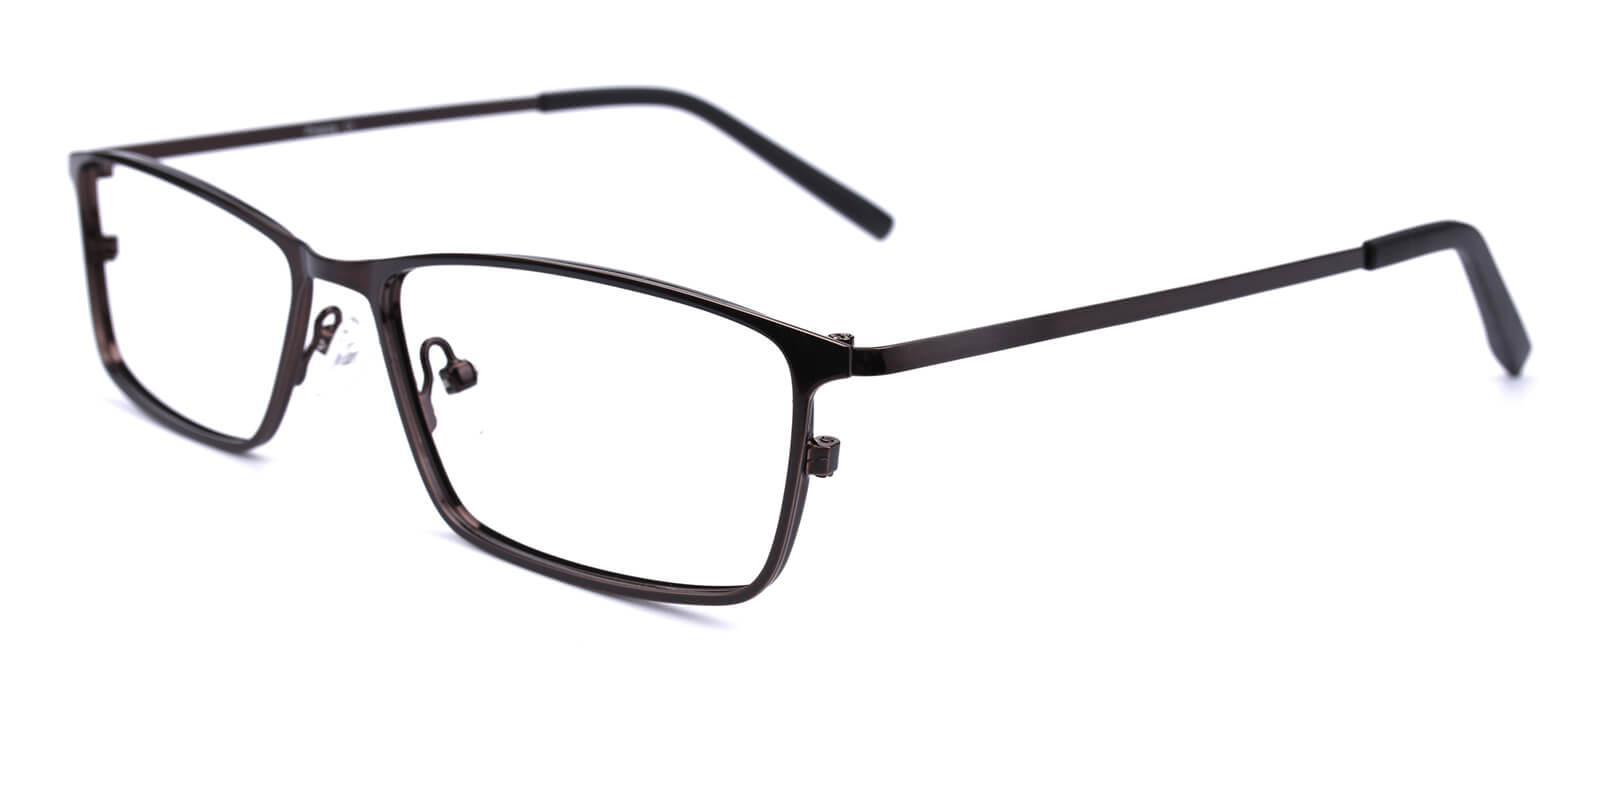 Wildfire-Brown-Rectangle-Metal-Eyeglasses-detail